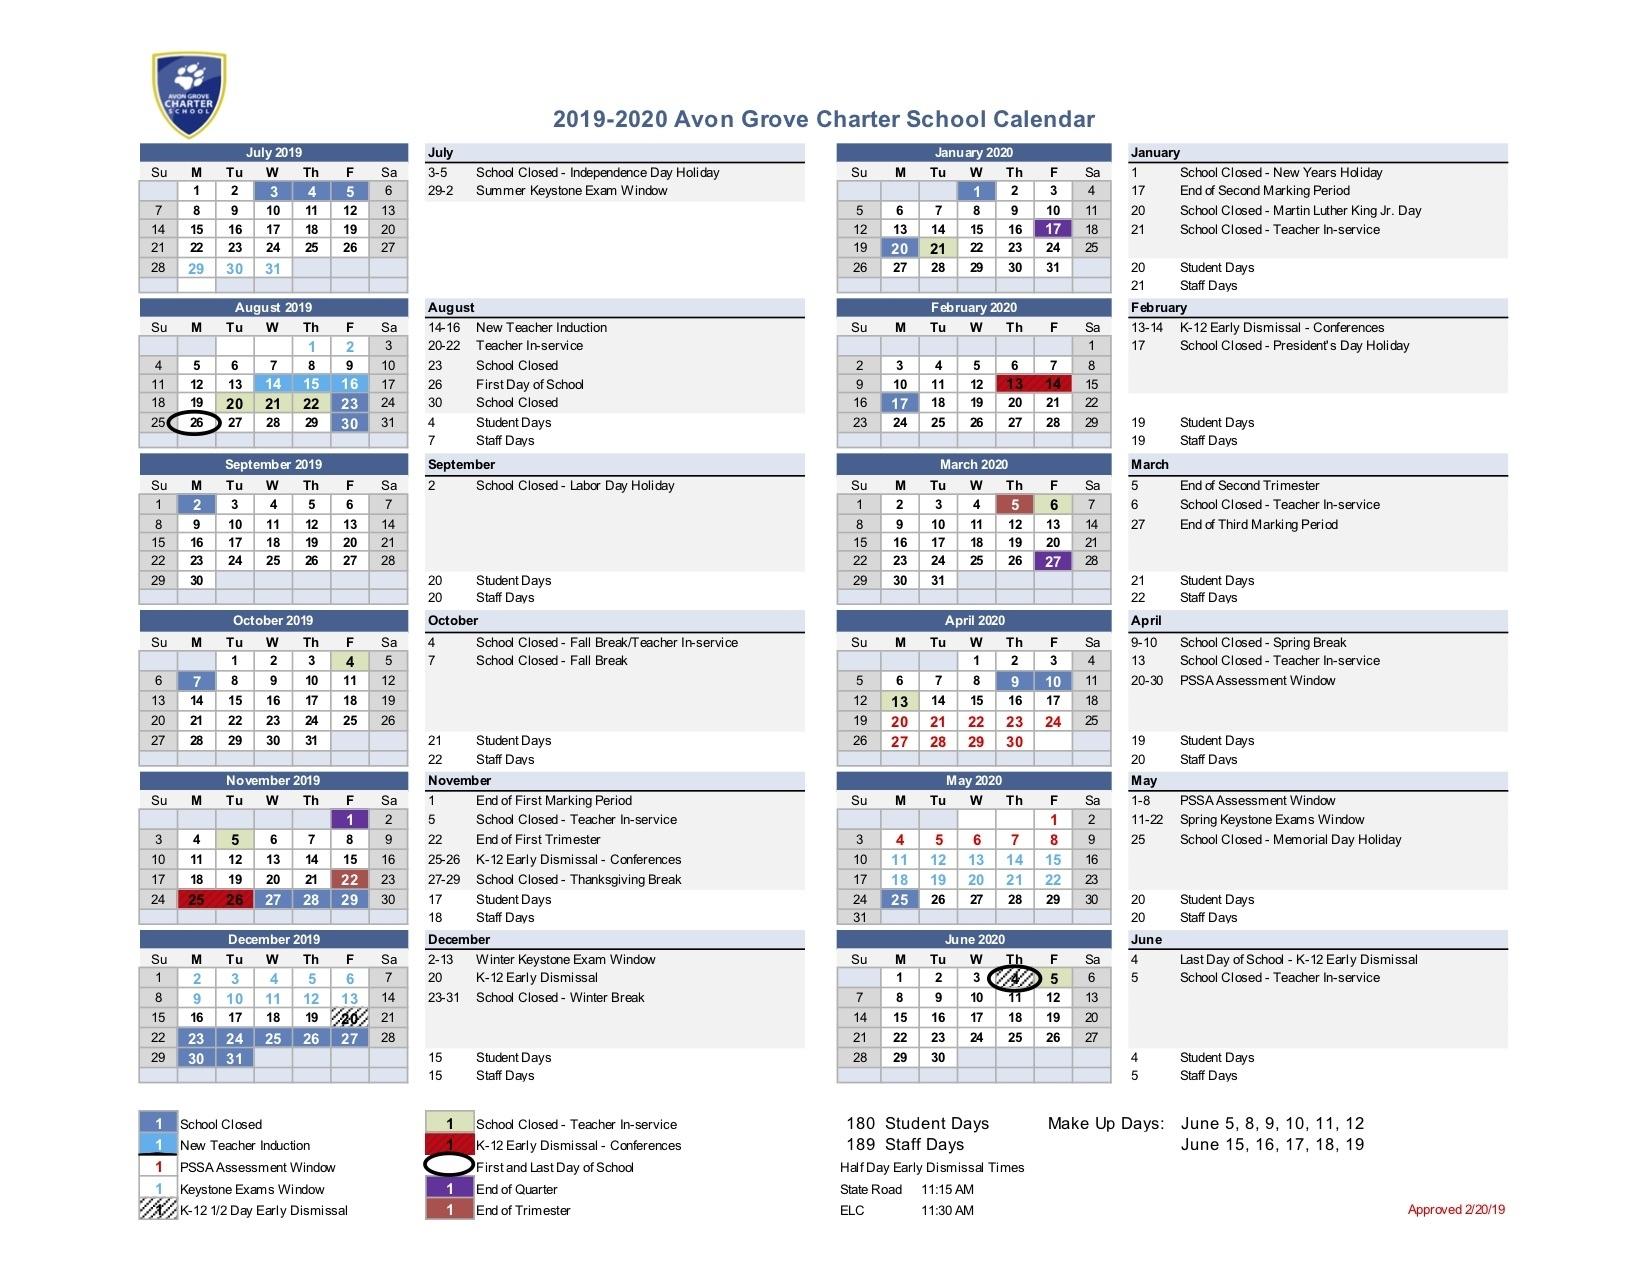 2019-2020 Approved Academic Calendar - Avon Grove Charter School Remarkable Tri C School Calendar